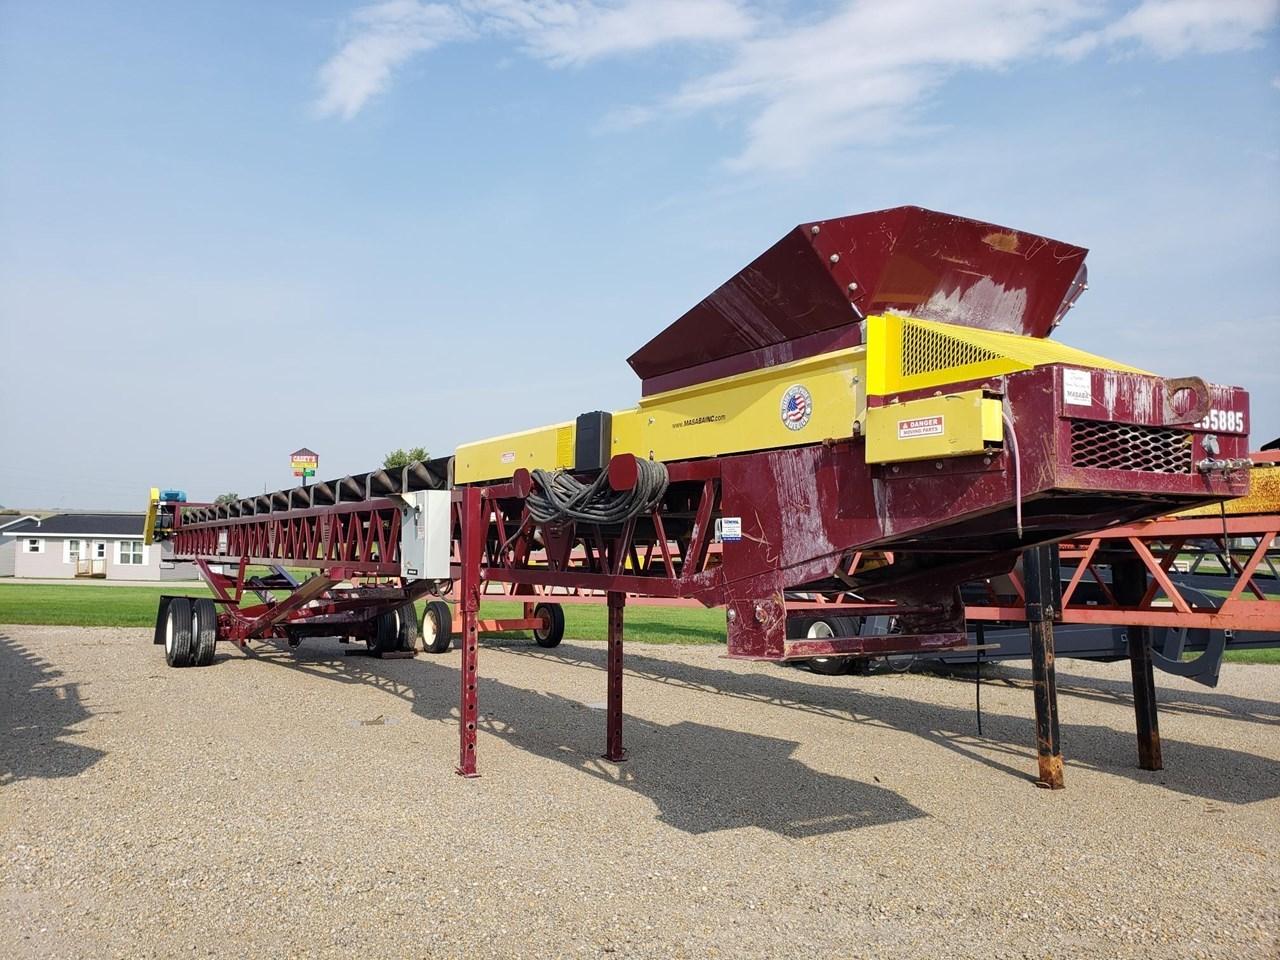 2014 Masaba 3680 Conveyor - Transfer For Sale